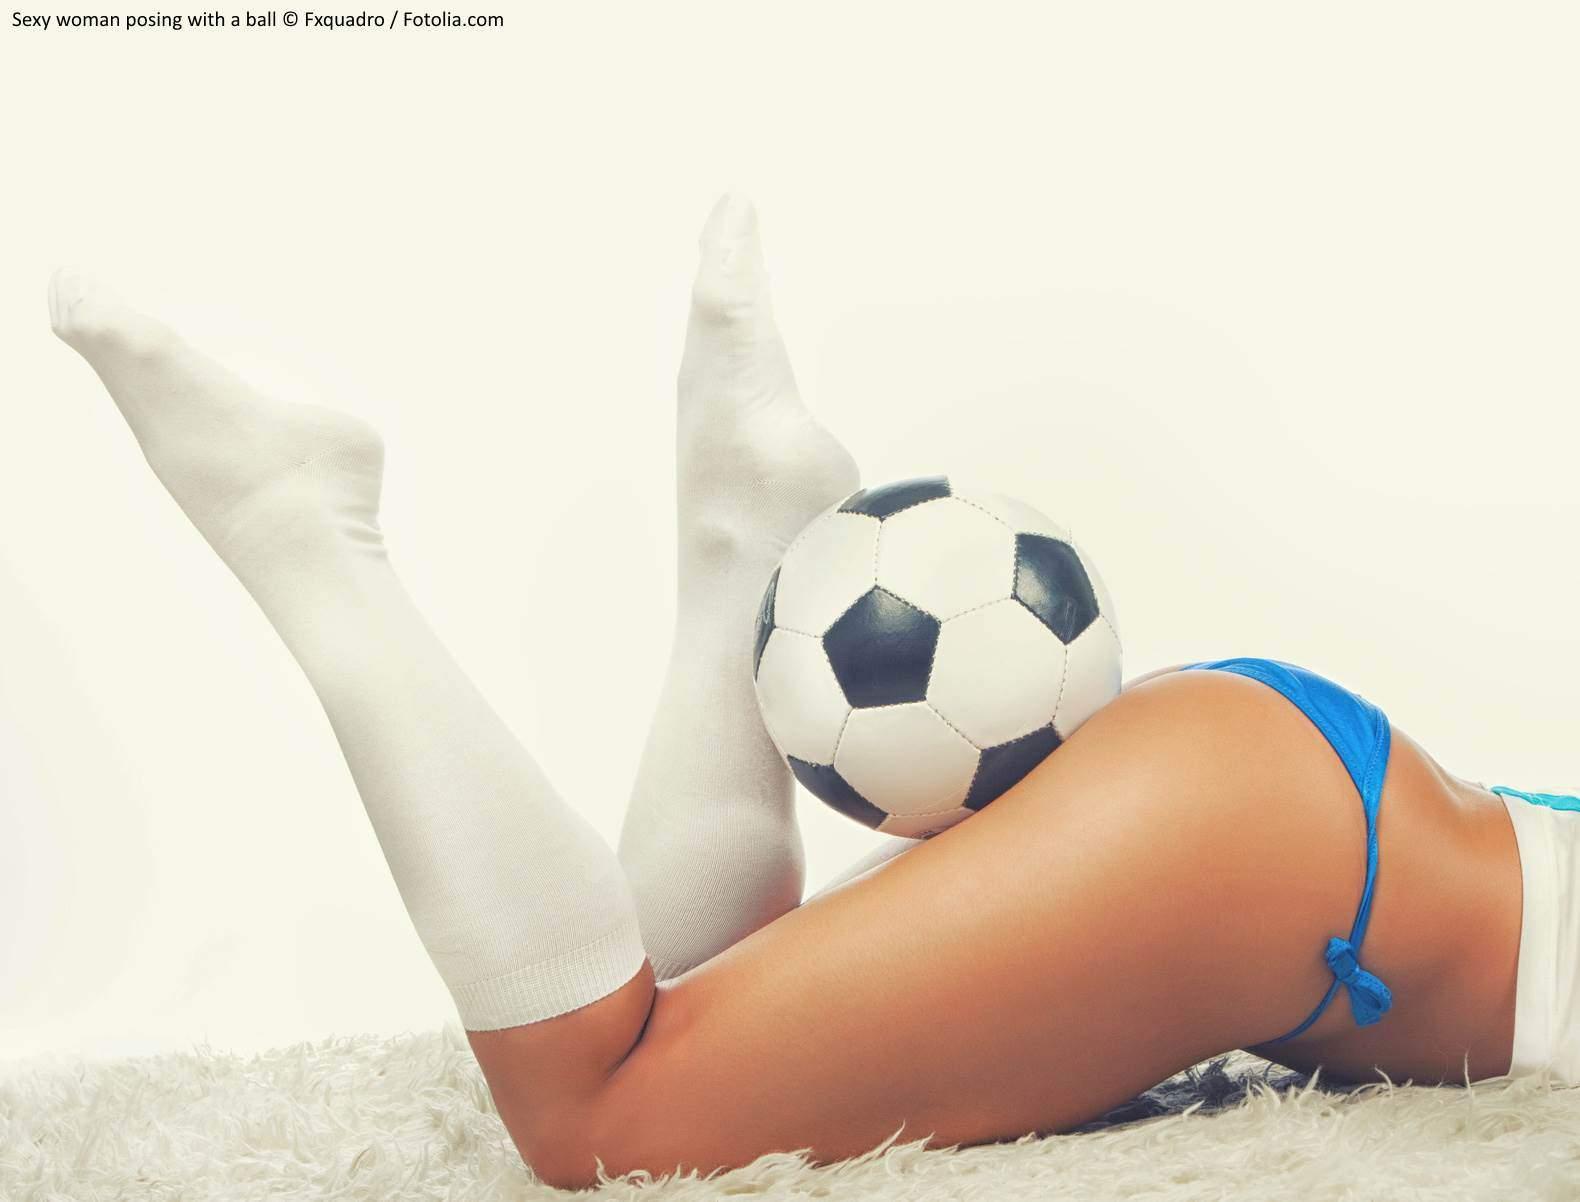 fussball wetten sicher gewinnen